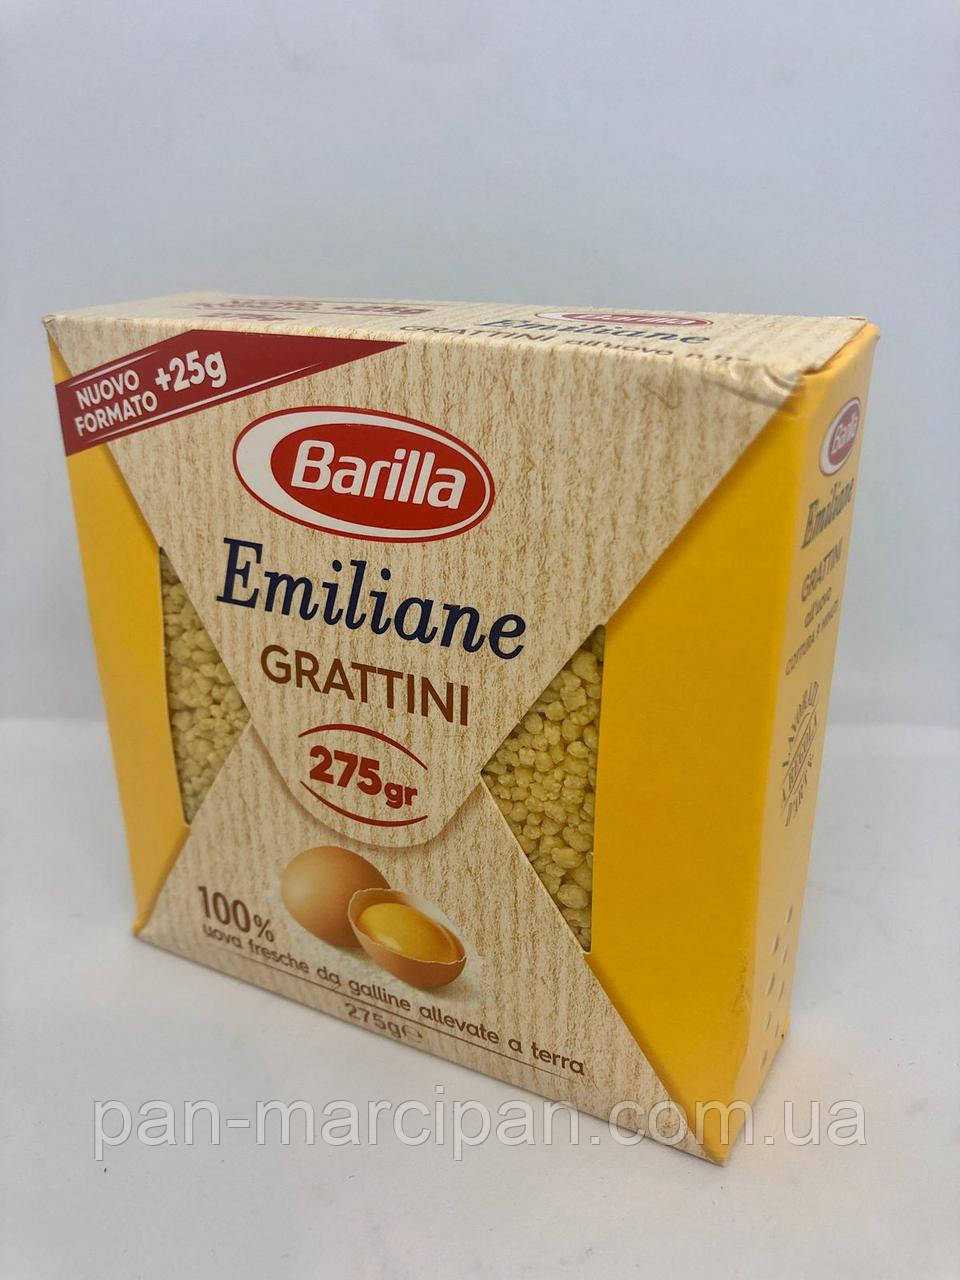 Макарони Barilla Emiliane Stelline на яєчному жовтку 275г